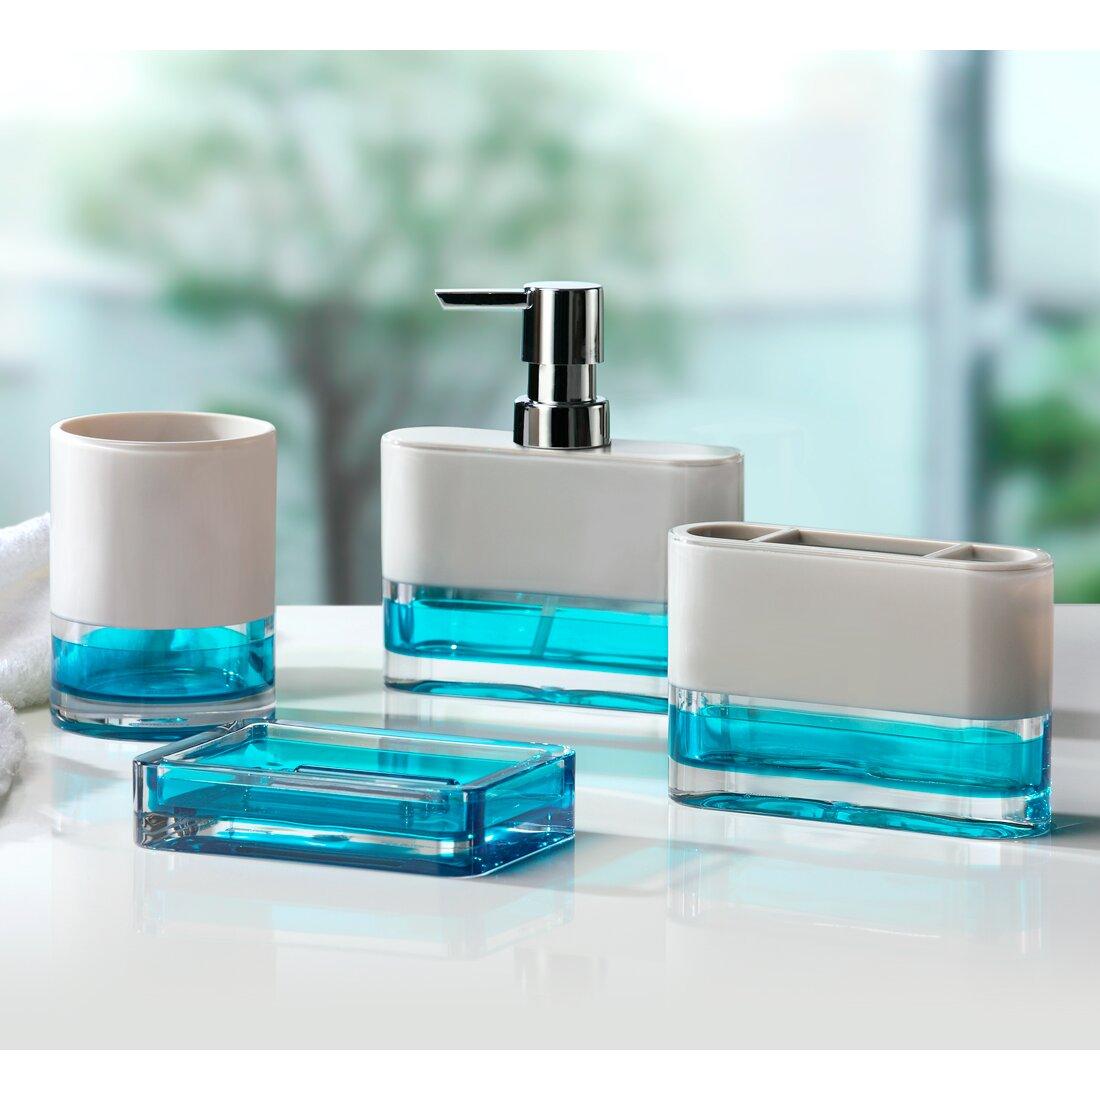 Bathroom Teal Bathroom Accessories Lovely Bathroom